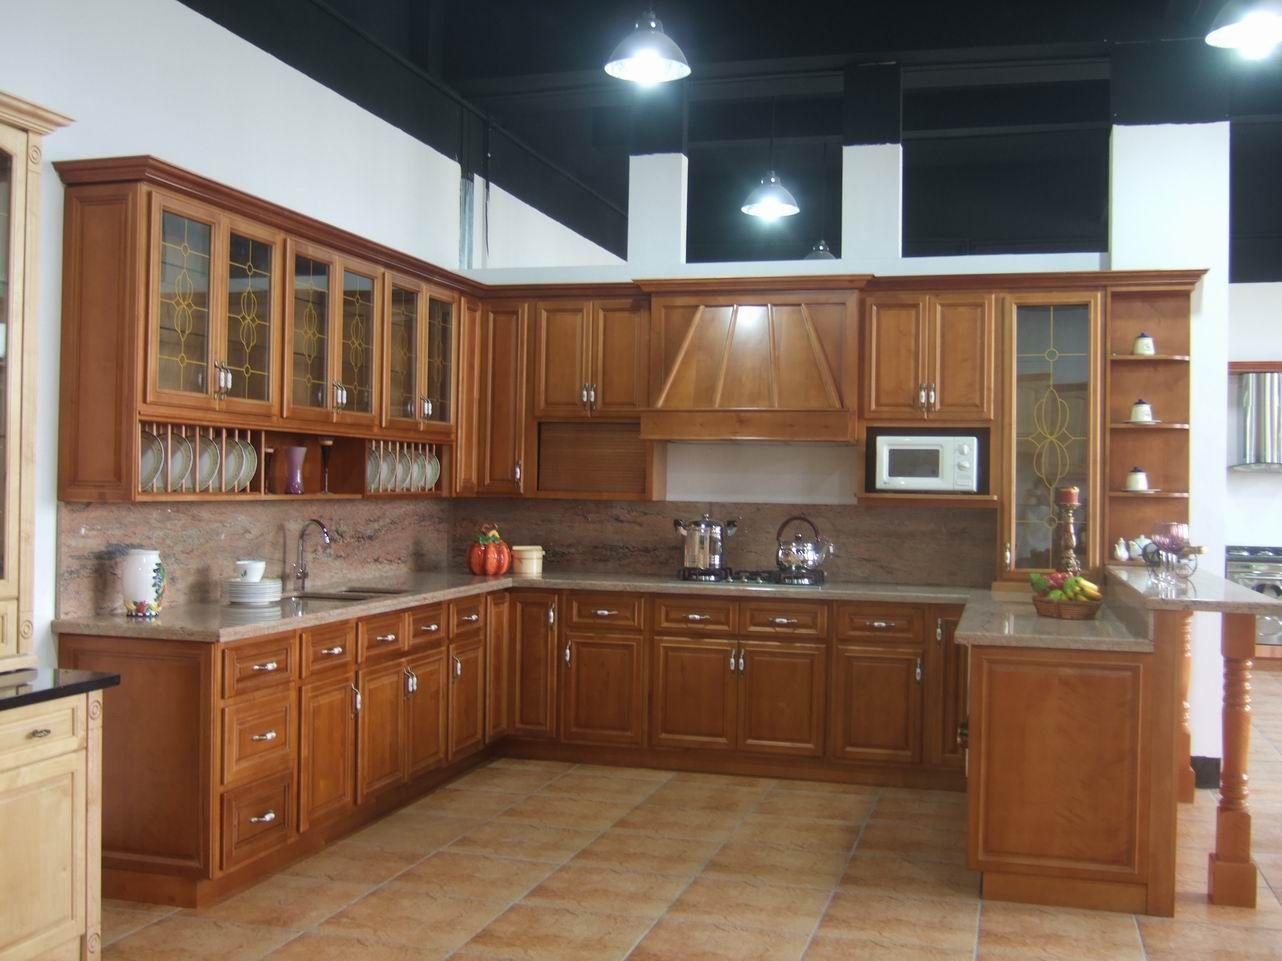 Timber Kitchen Moulding Hardwood Softwood Illingworth Ingham Kitchen Furniture Design Kitchen Interior Interior Design Kitchen